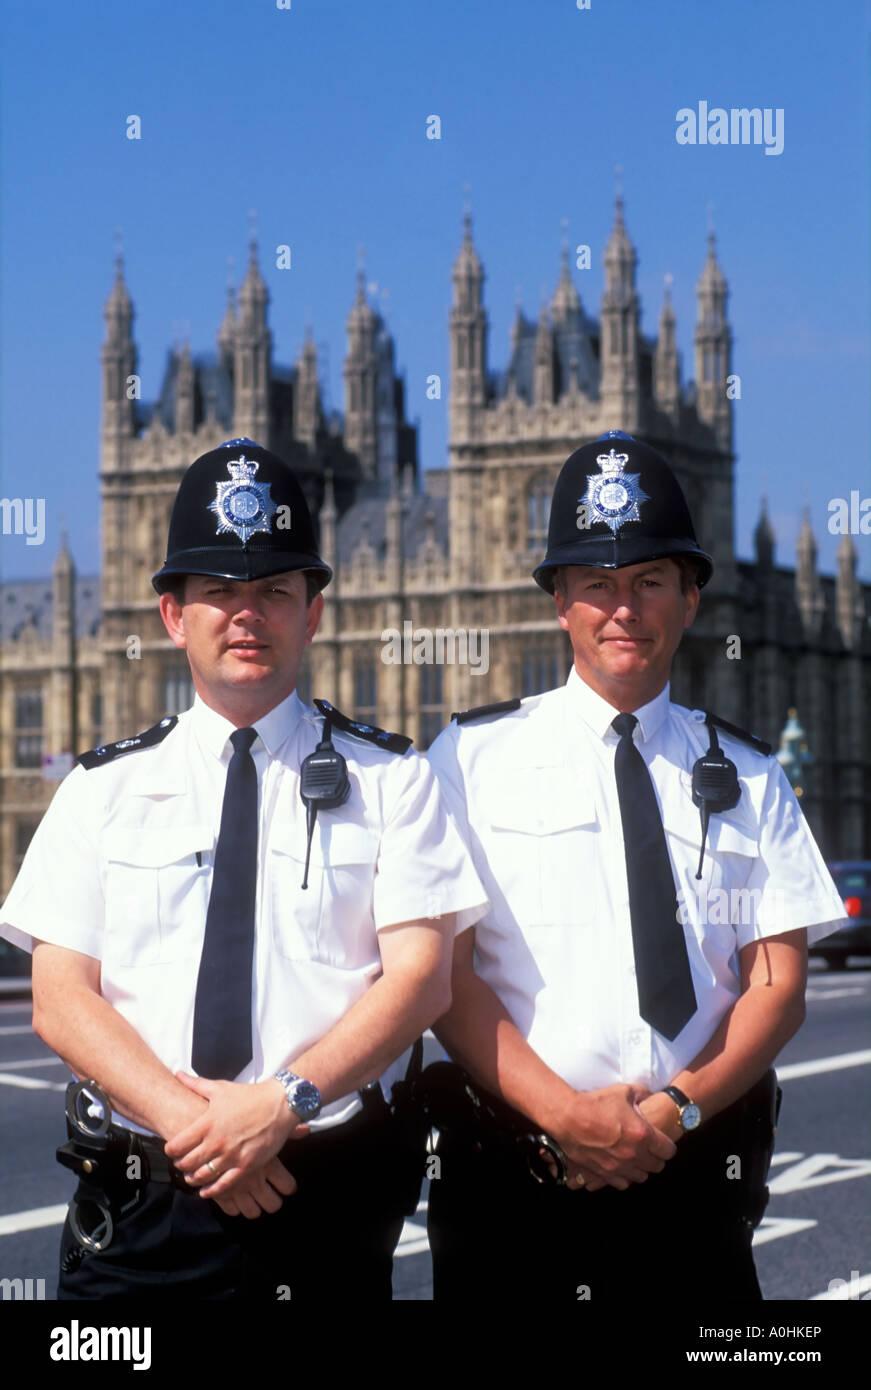 Westminster Bobbies. London, England Stock Photo: 10000989 ...